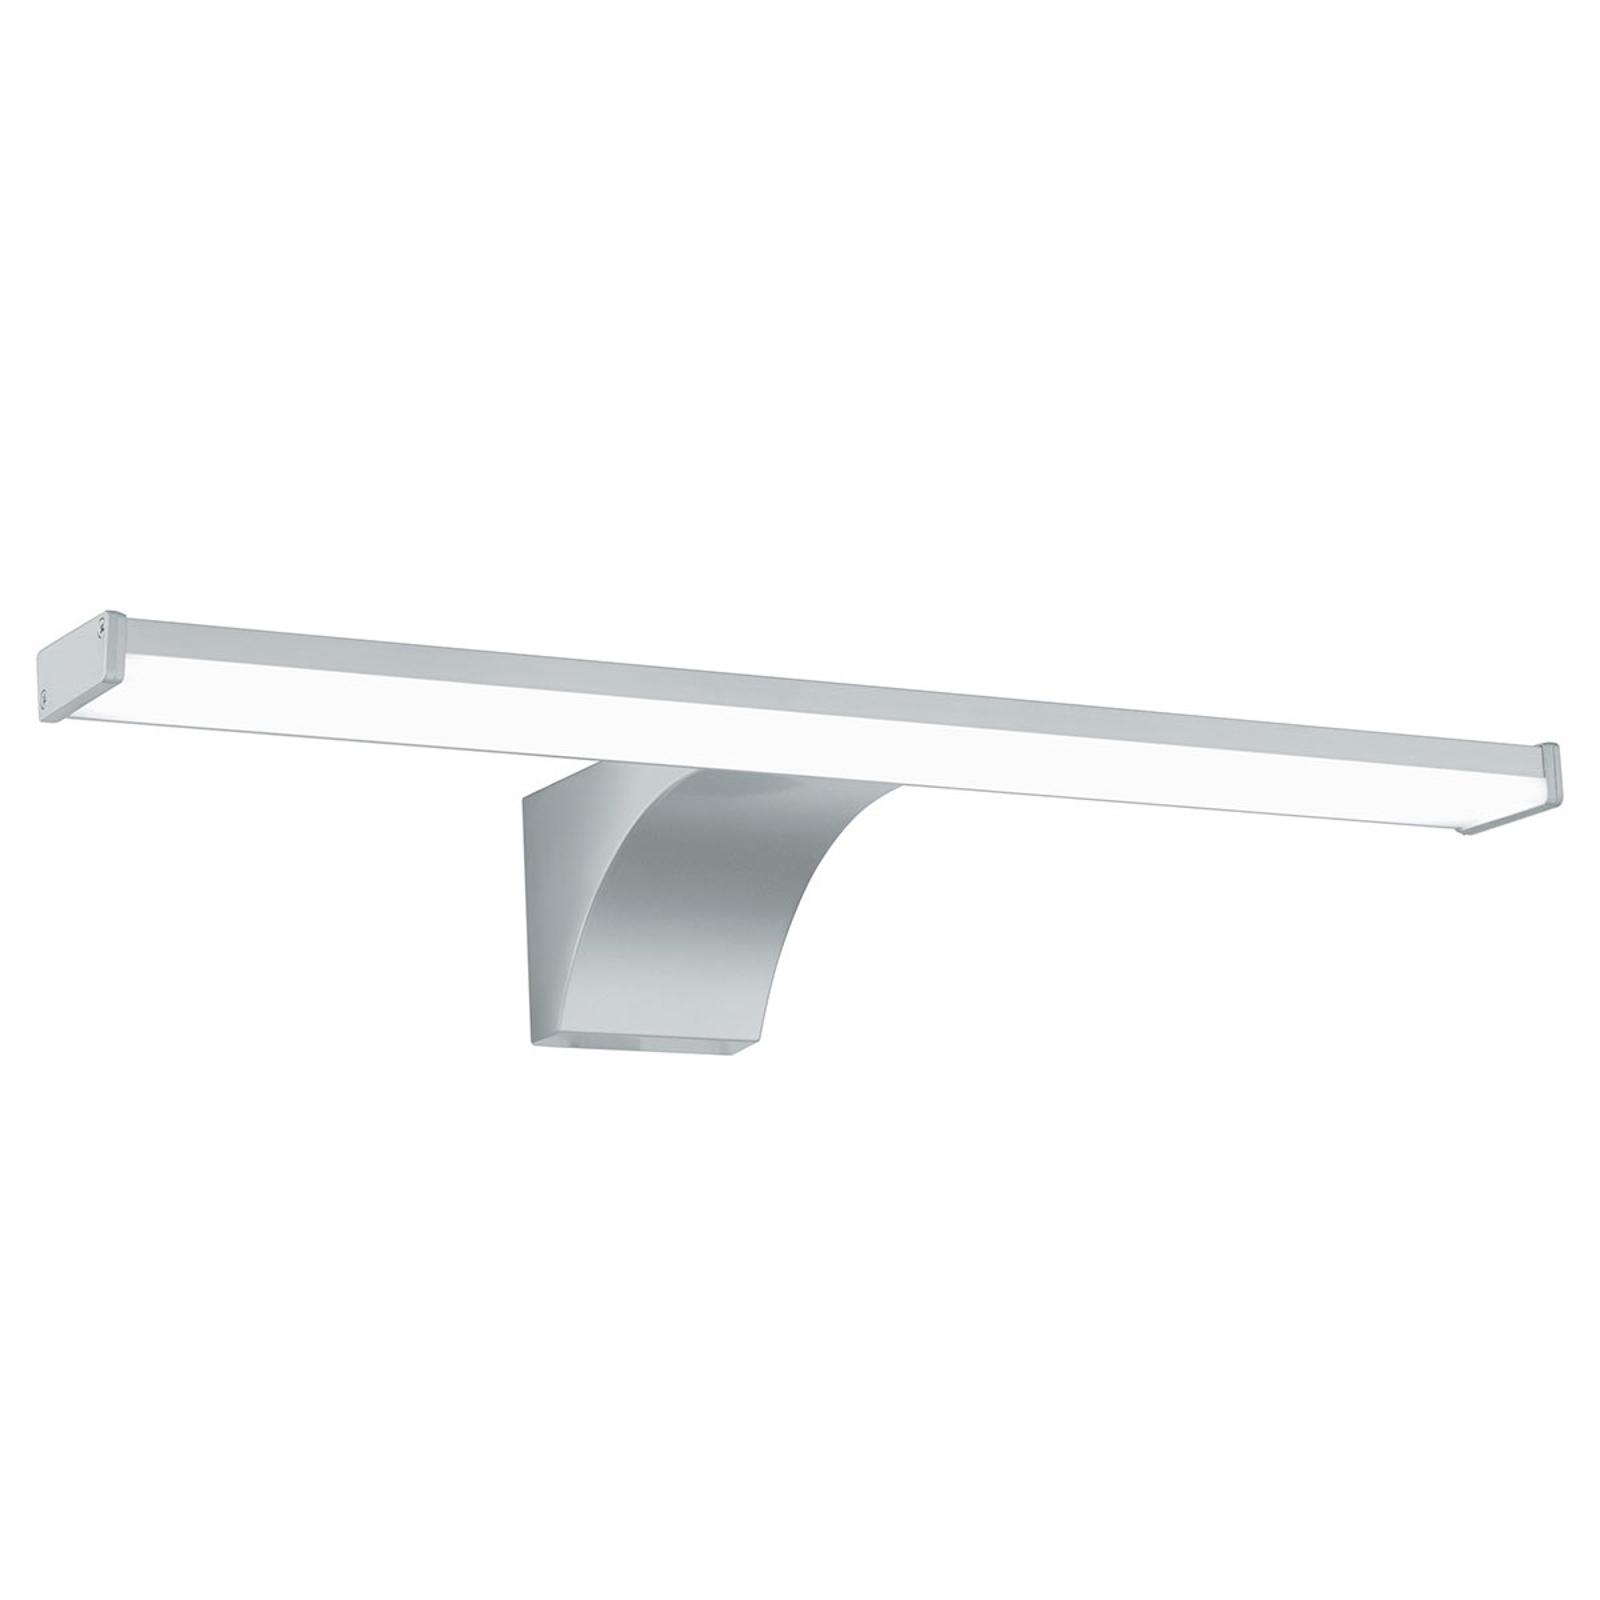 LED-spiegellamp Pandella 2 IP44